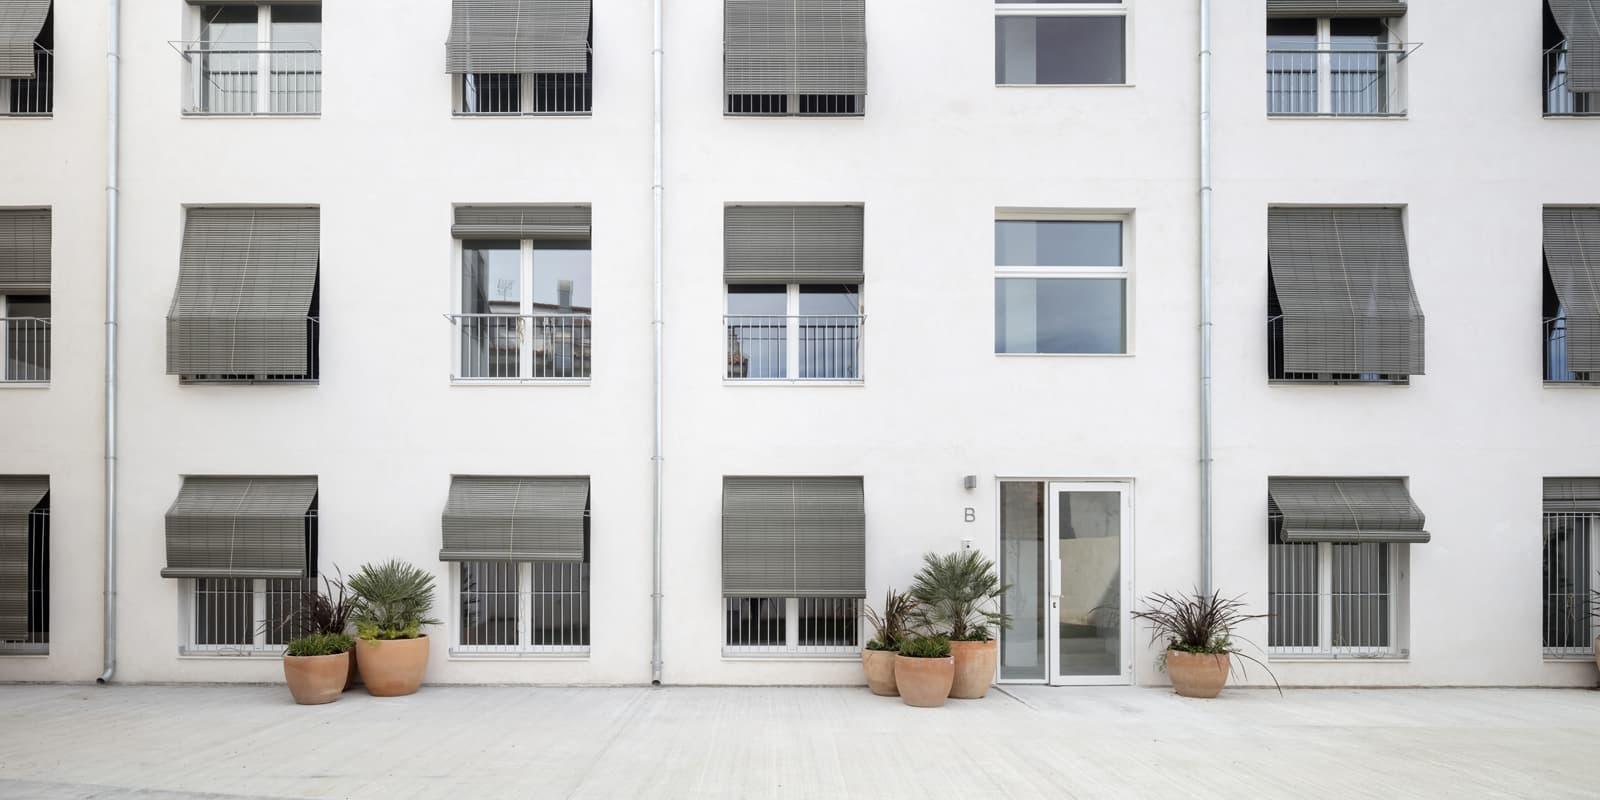 Habitatges Sant Pere de Ribes  - 20210617 DATAAE Habitatges 04 39